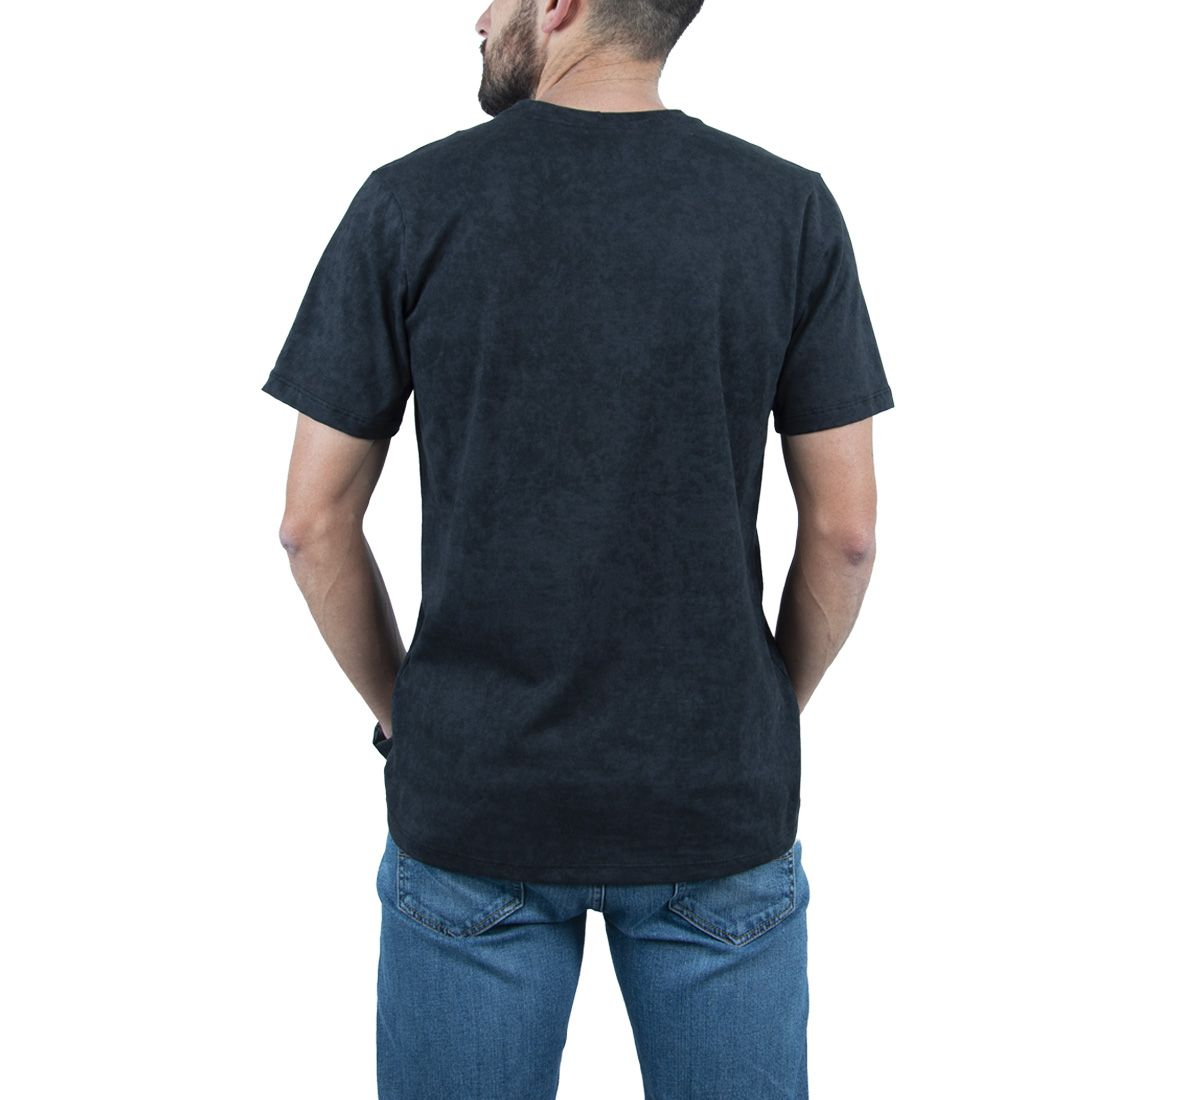 Camiseta Play Fair Masc - Preto - Woom 247